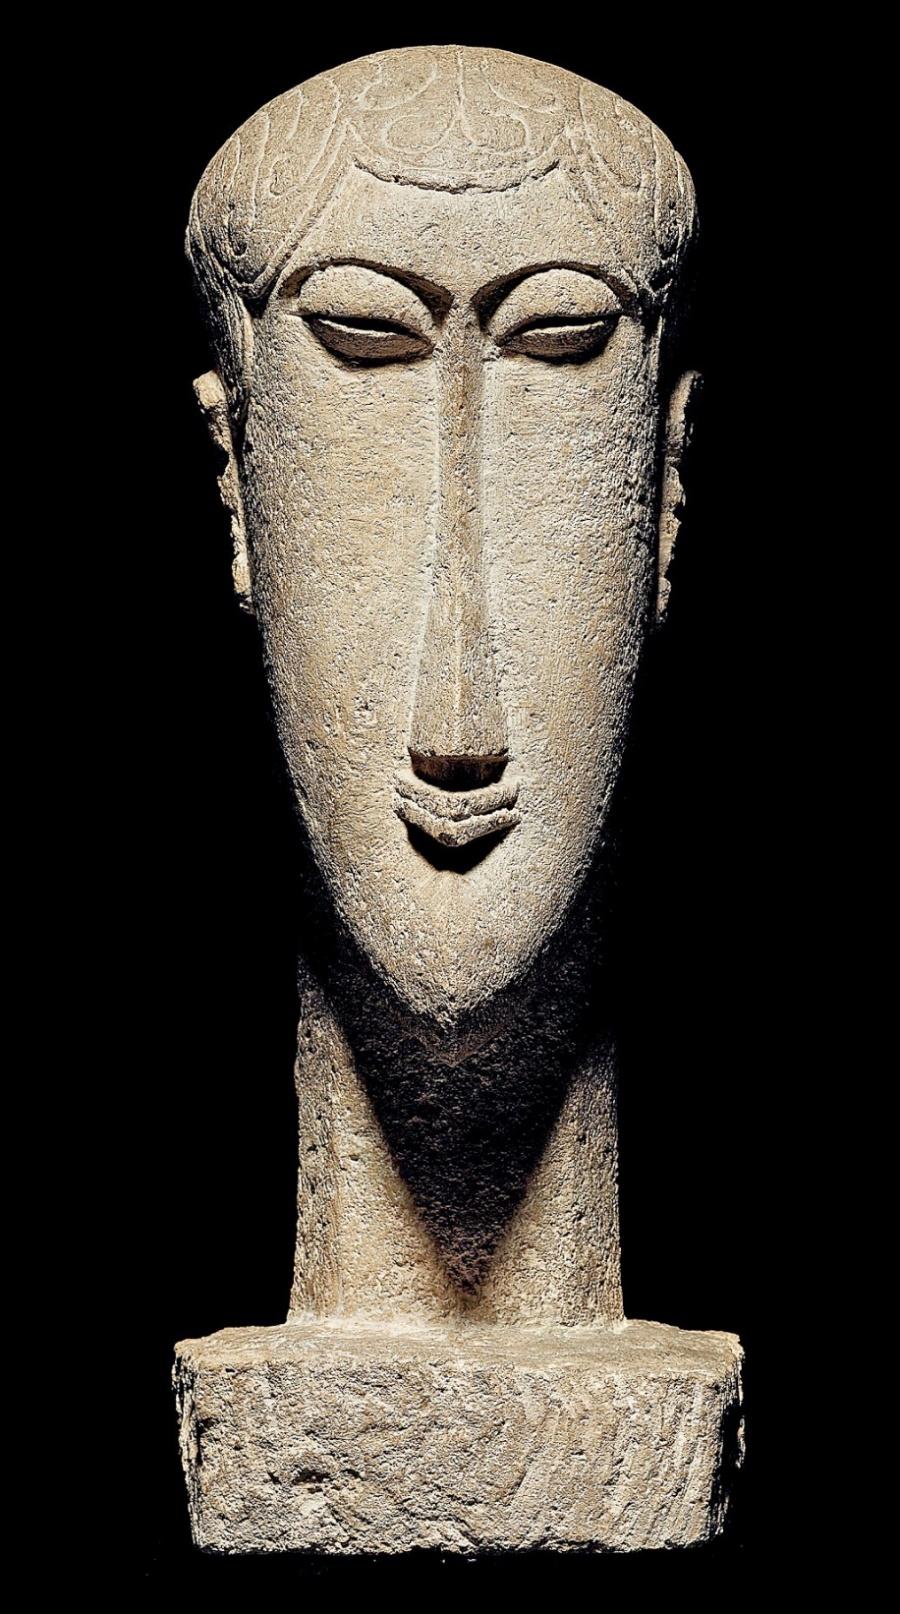 Subastan otra vez 1 de 26 esculturas de Modigliani